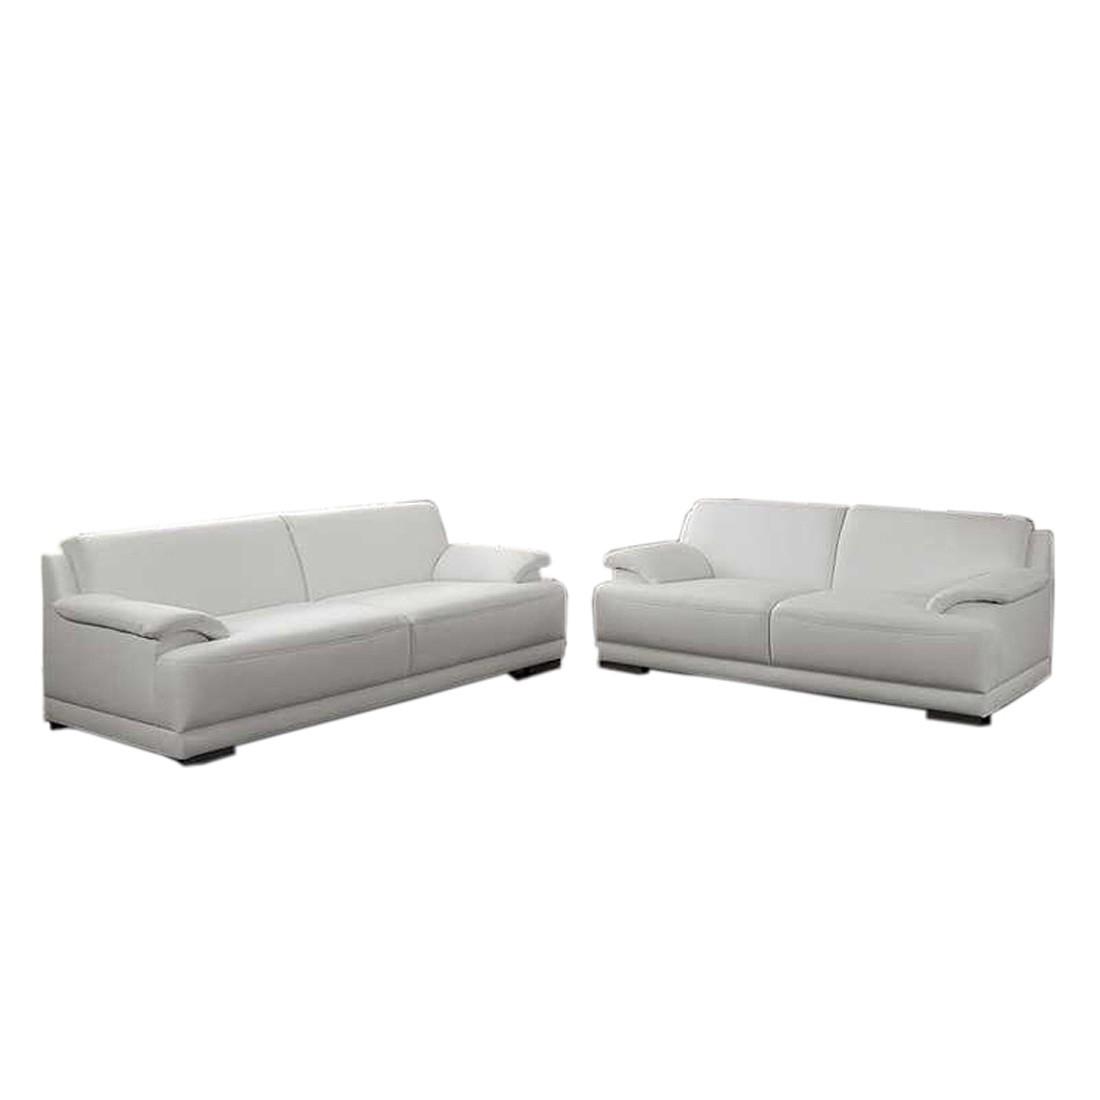 playmobil autobus 6773 playmobil aanbieding kopen. Black Bedroom Furniture Sets. Home Design Ideas